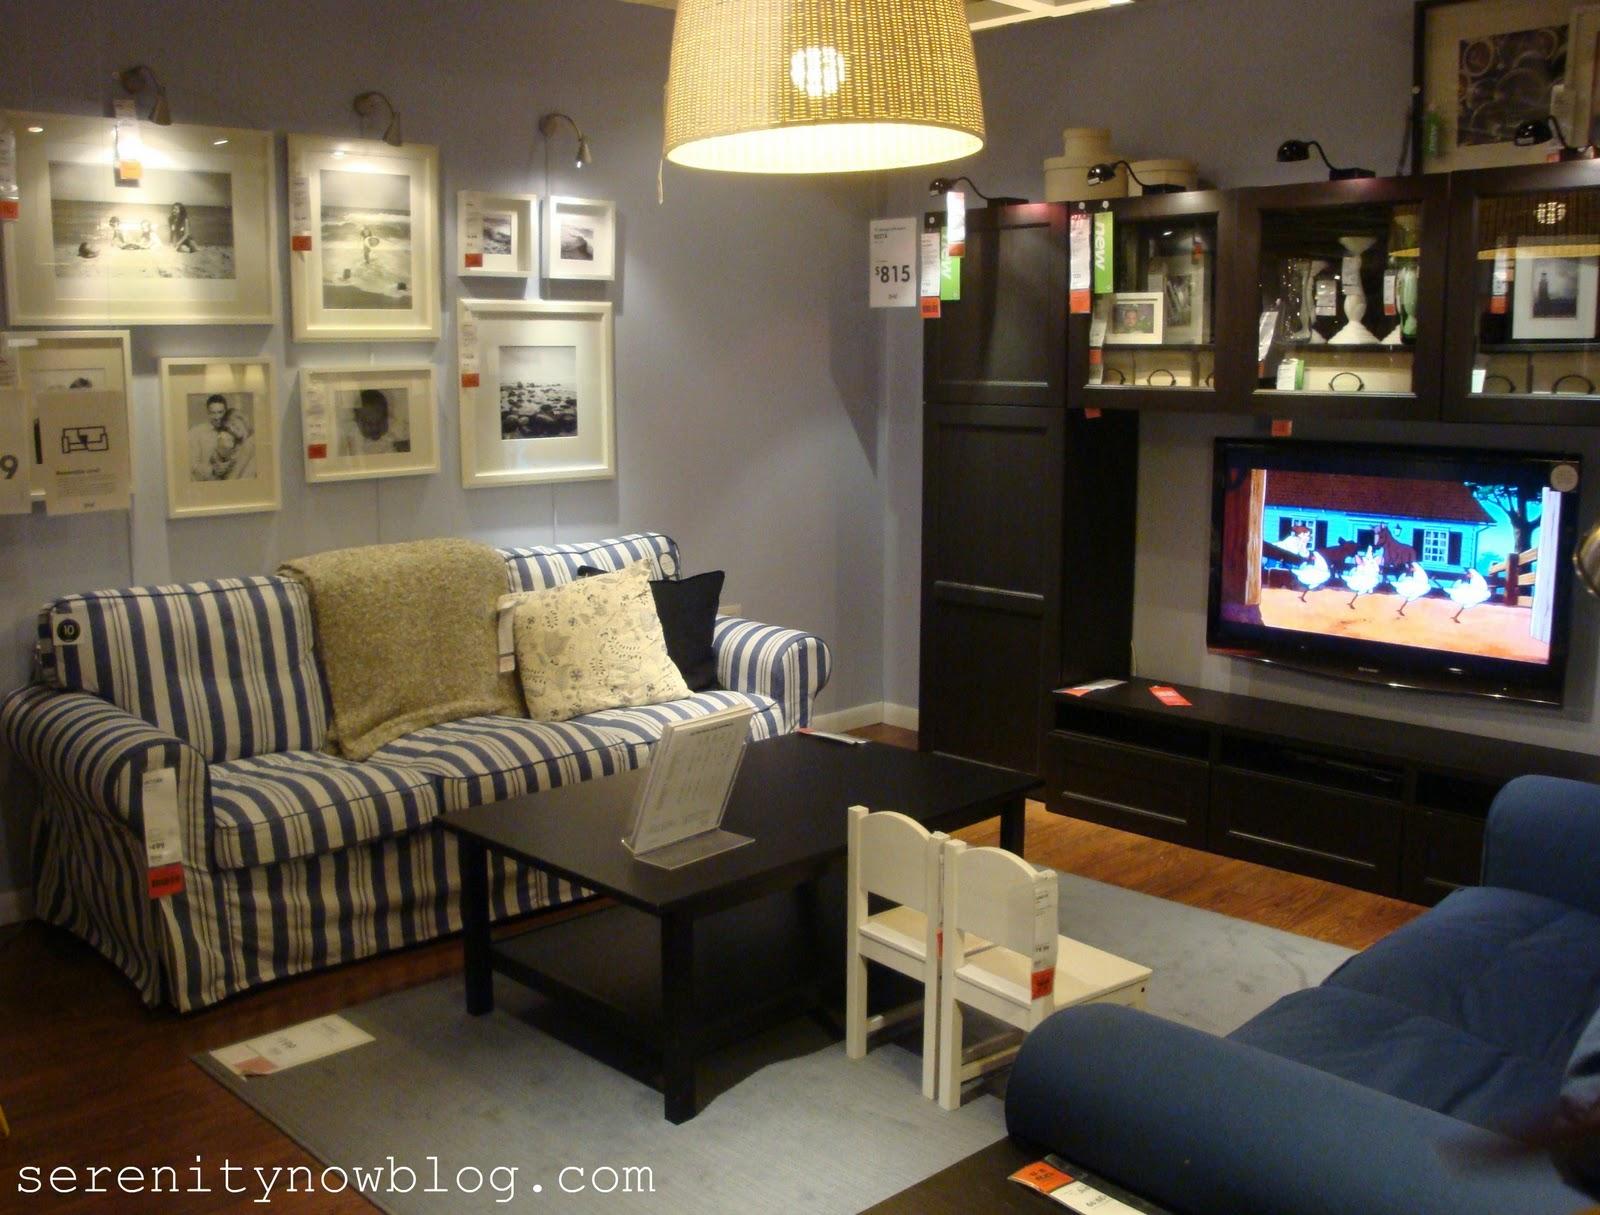 http://i0.wp.com/3.bp.blogspot.com/-V5MvOocFEBU/TxYE3picsFI/AAAAAAAAJX0/Kuqch-YABok/s1600/IKEA+Home+Decor+ideas+Serenity+Now+blog.jpg